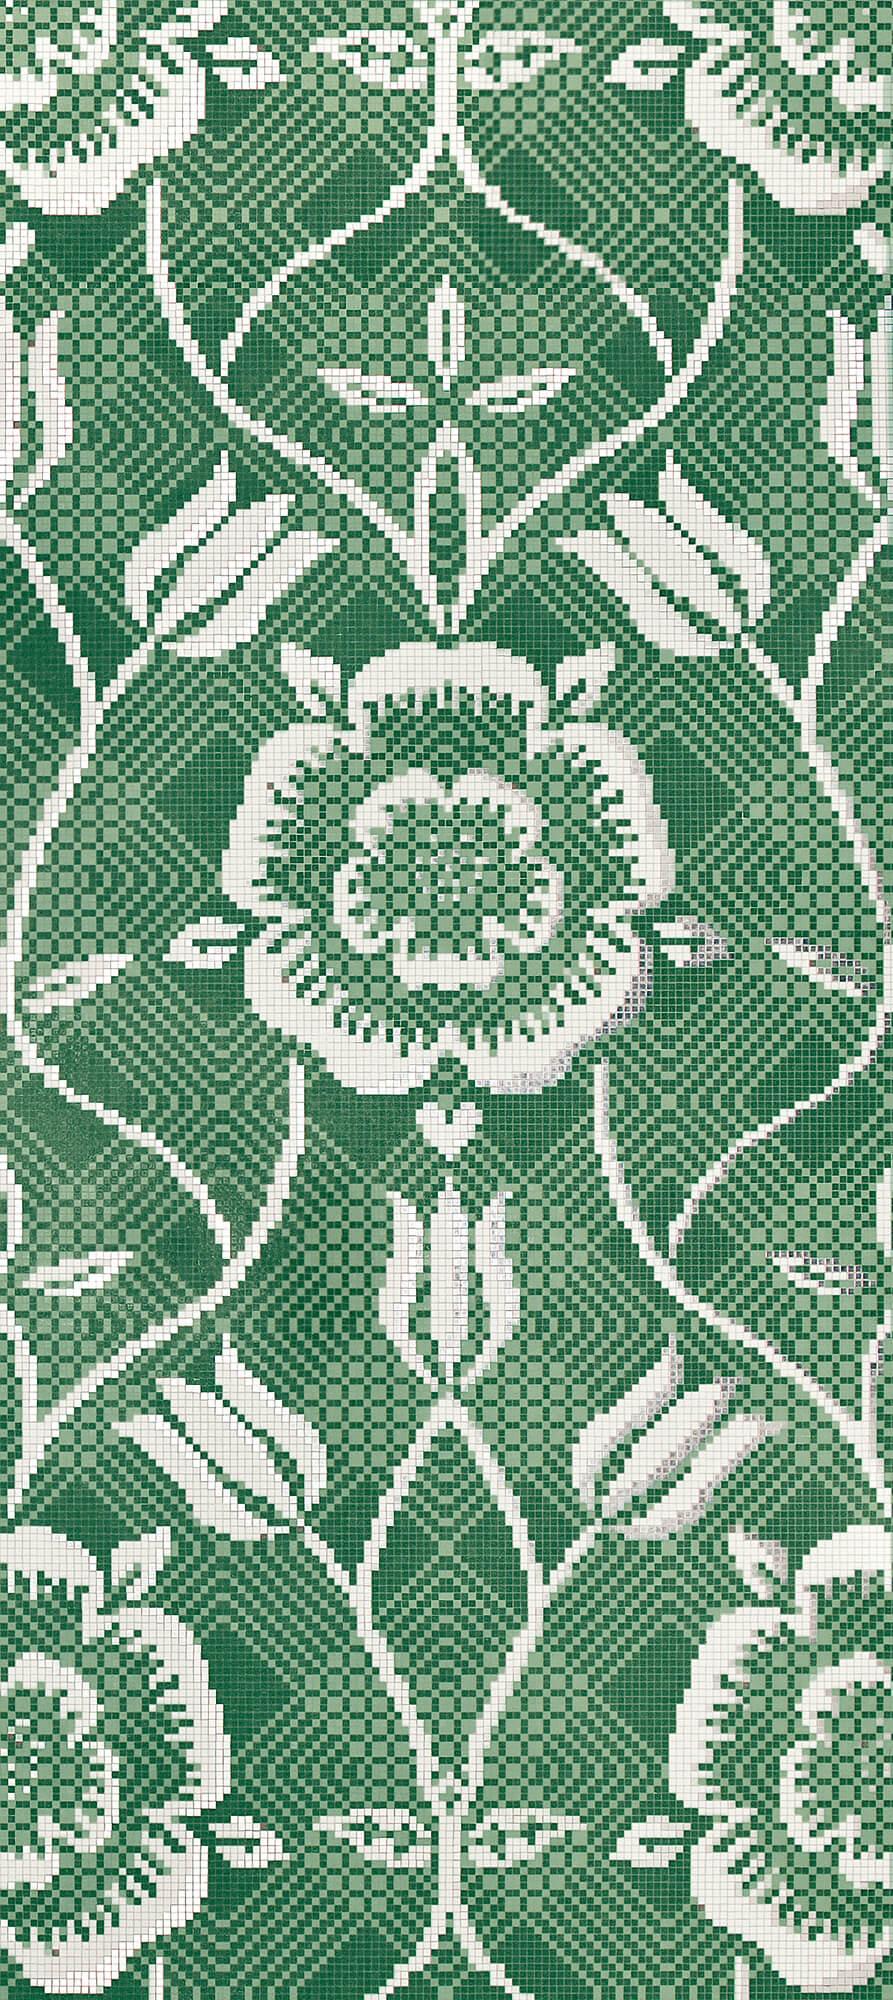 Insula Green